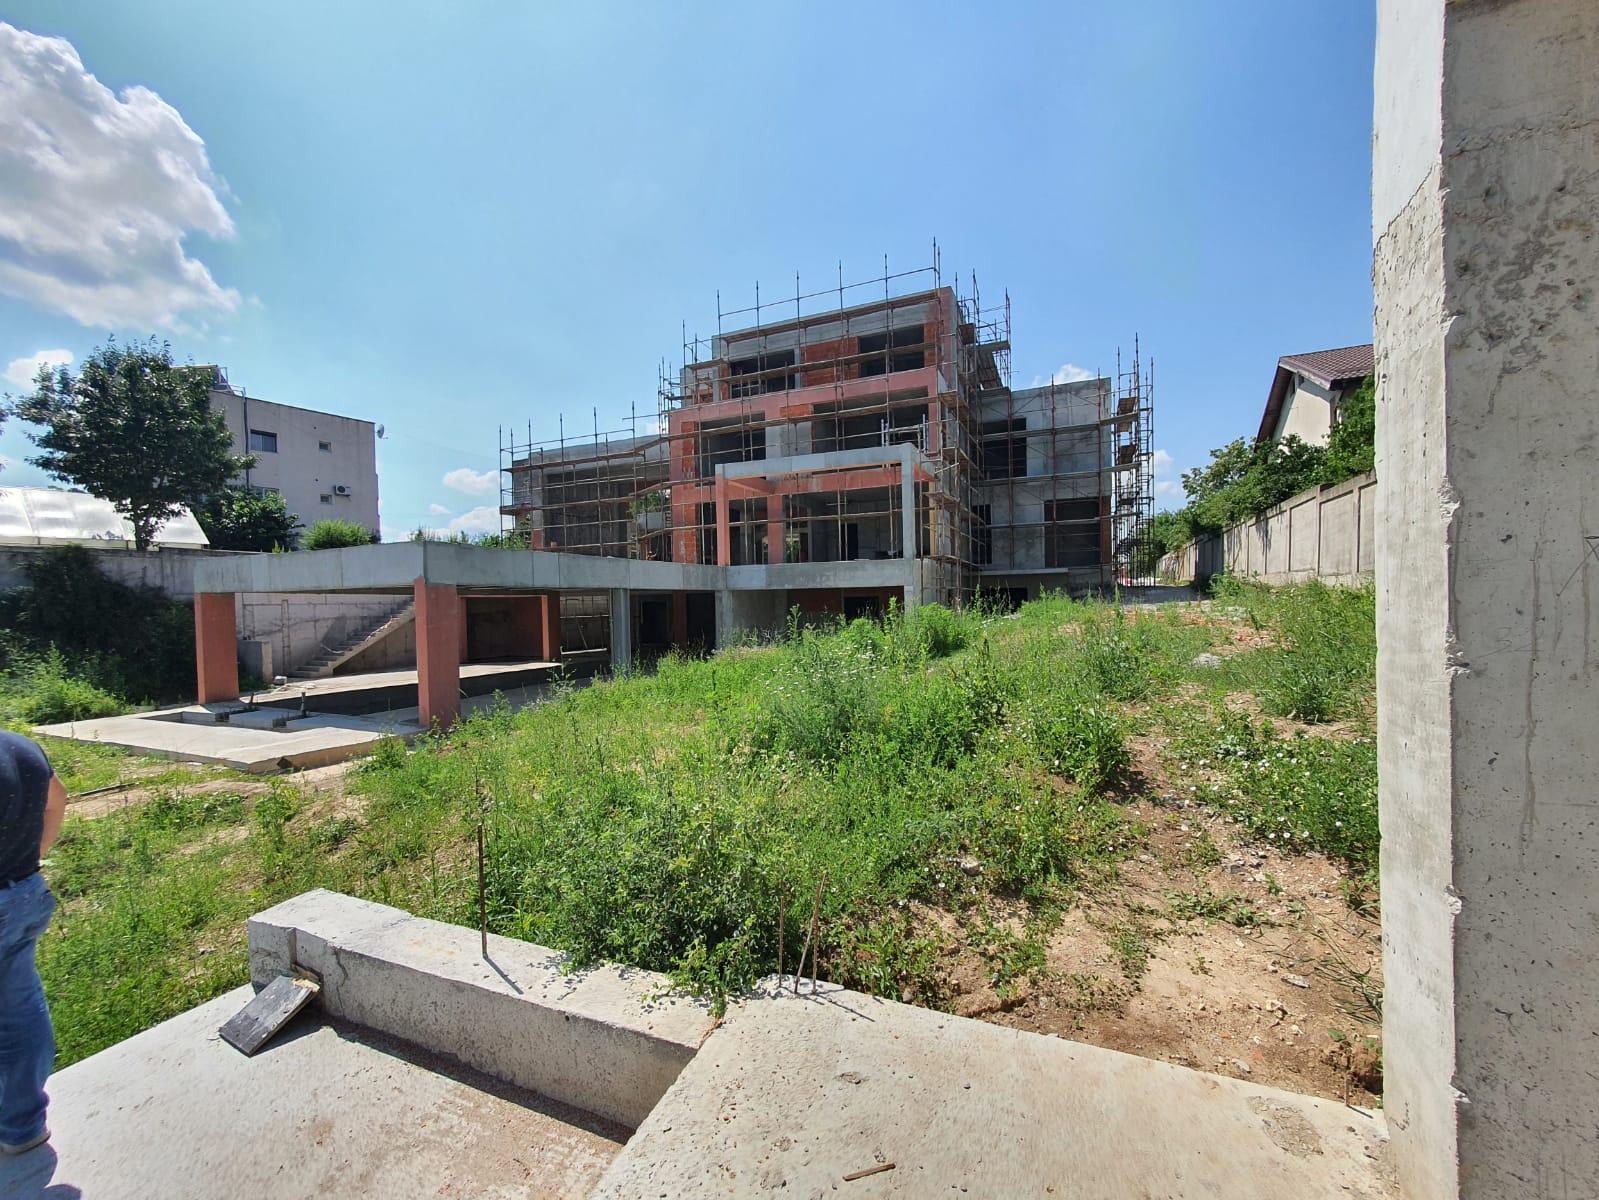 https://nbc-arhitect.ro/wp-content/uploads/2020/10/NBC-Arhitect-_-residences-_-Mogo-Villa-_-Romania-_-in-progress_6.jpeg